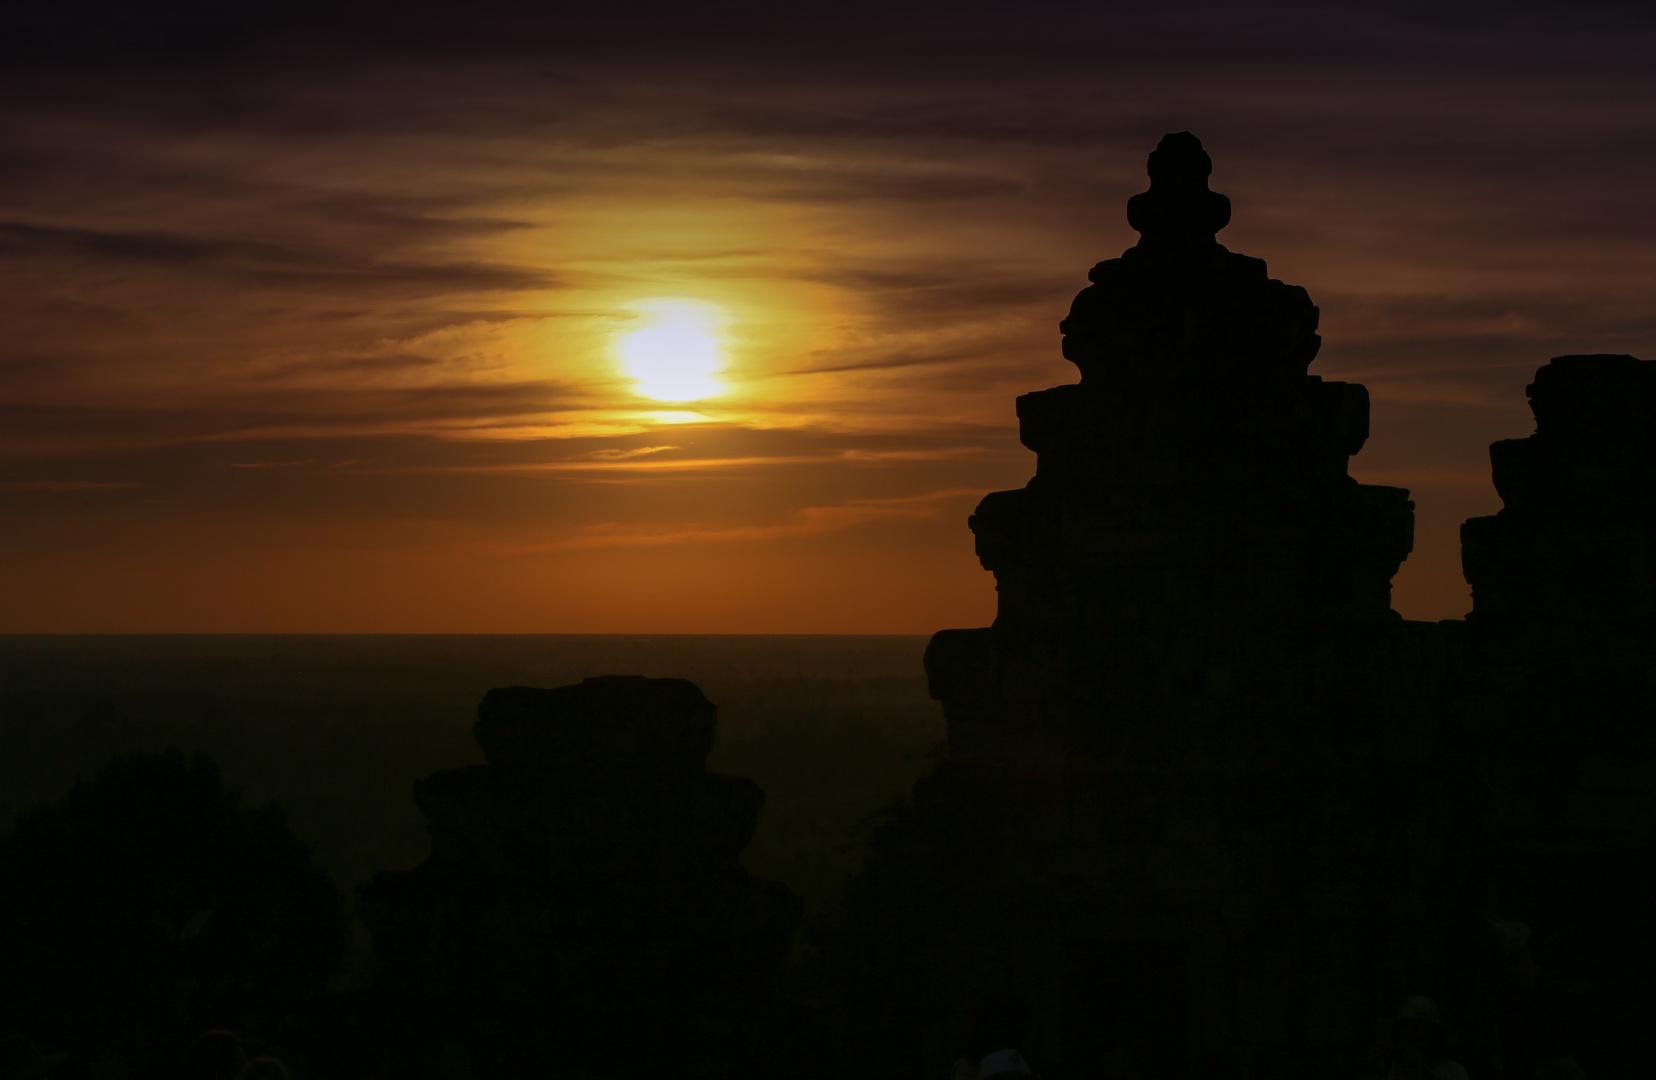 Sonnenuntergang über Angkor mit Tempelspitzen